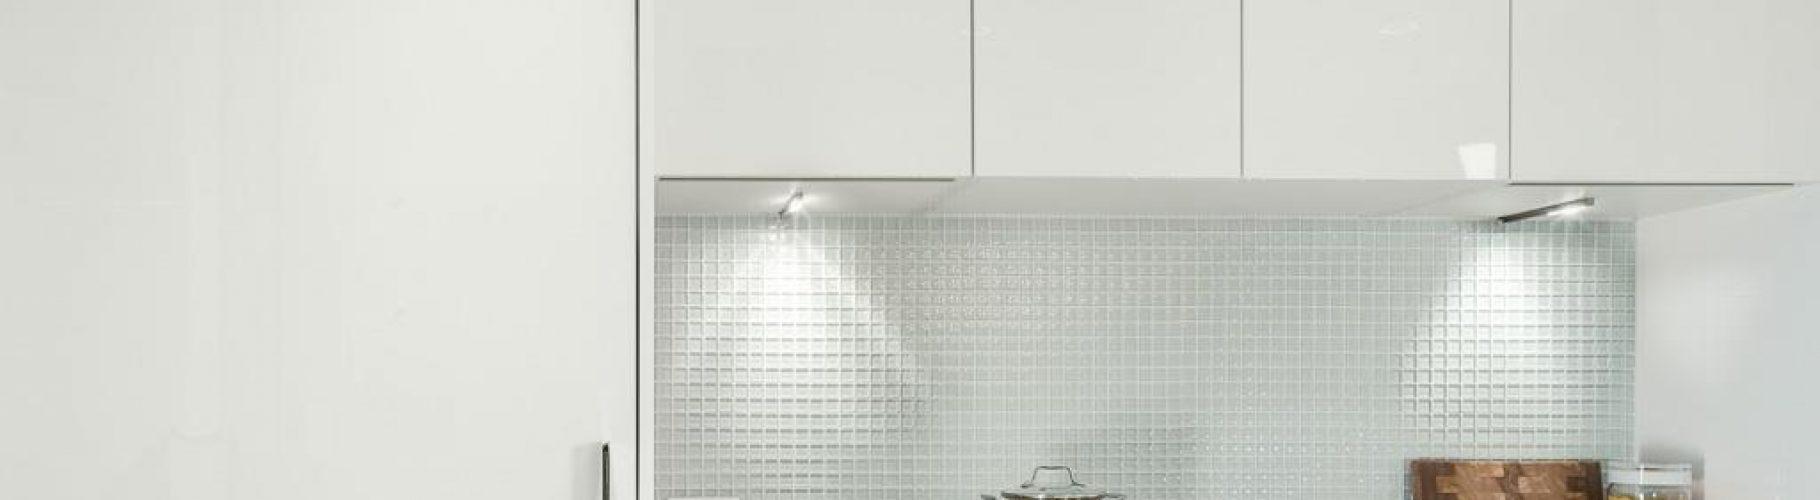 mark-on-10th-cooktop-fridge